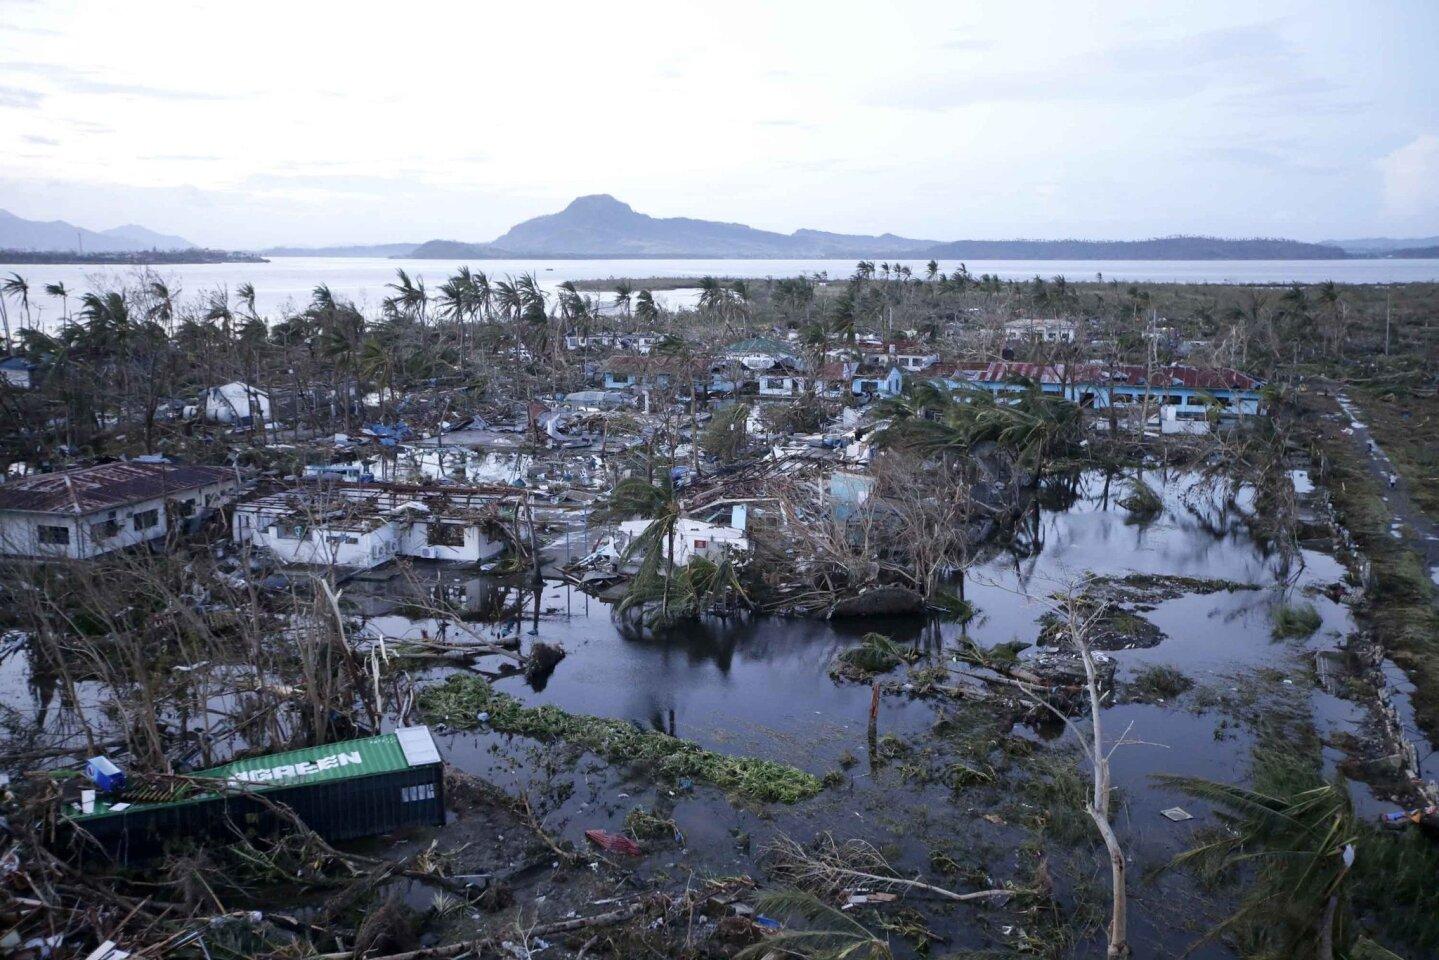 Typhoon ravages Philippines